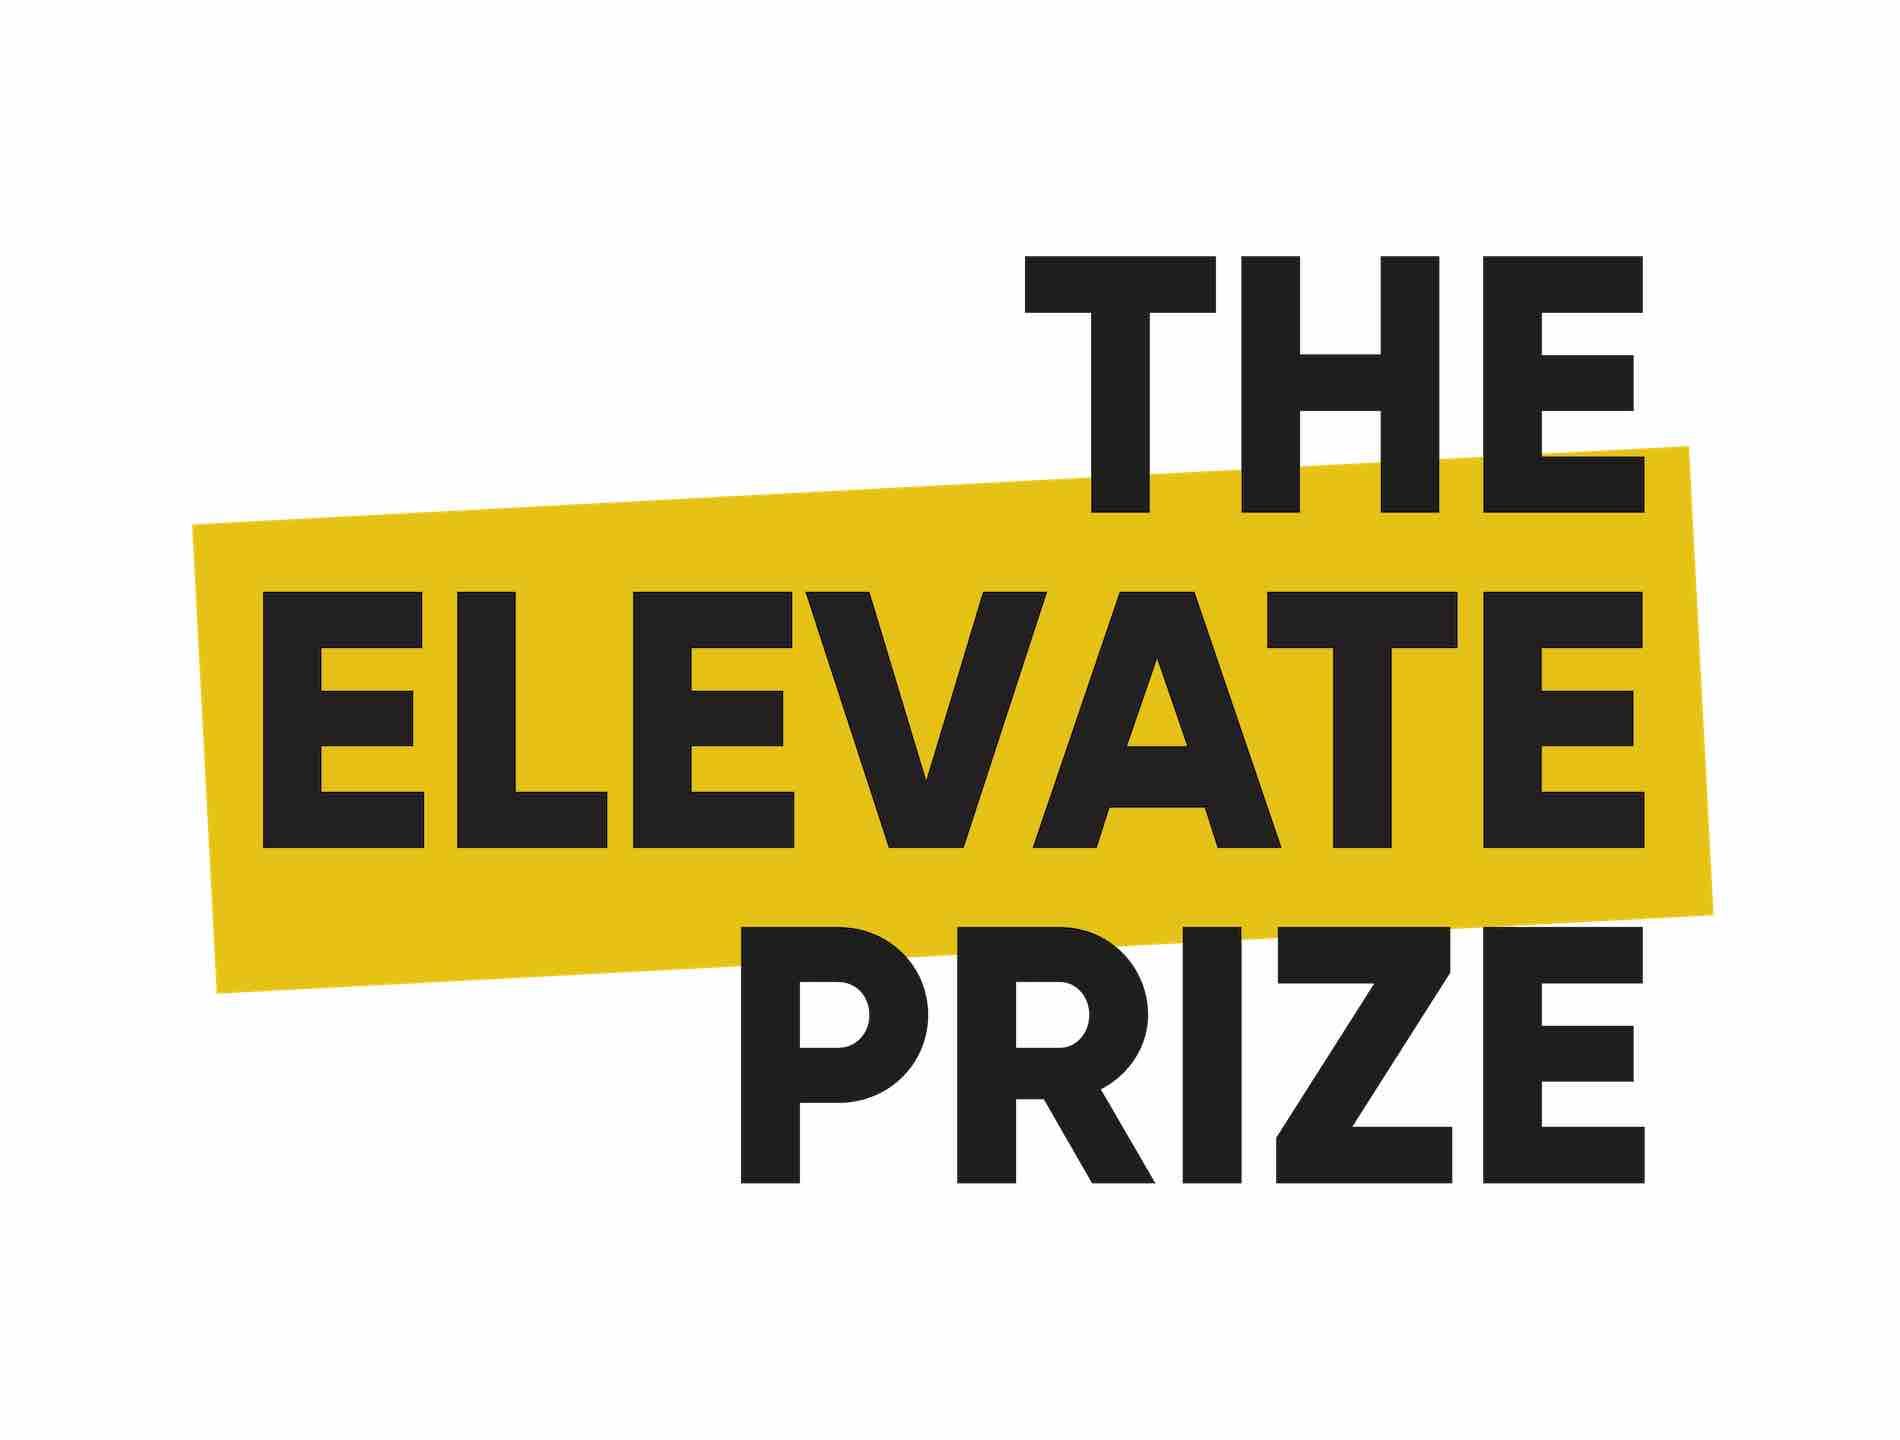 Elevate Prize Foundation